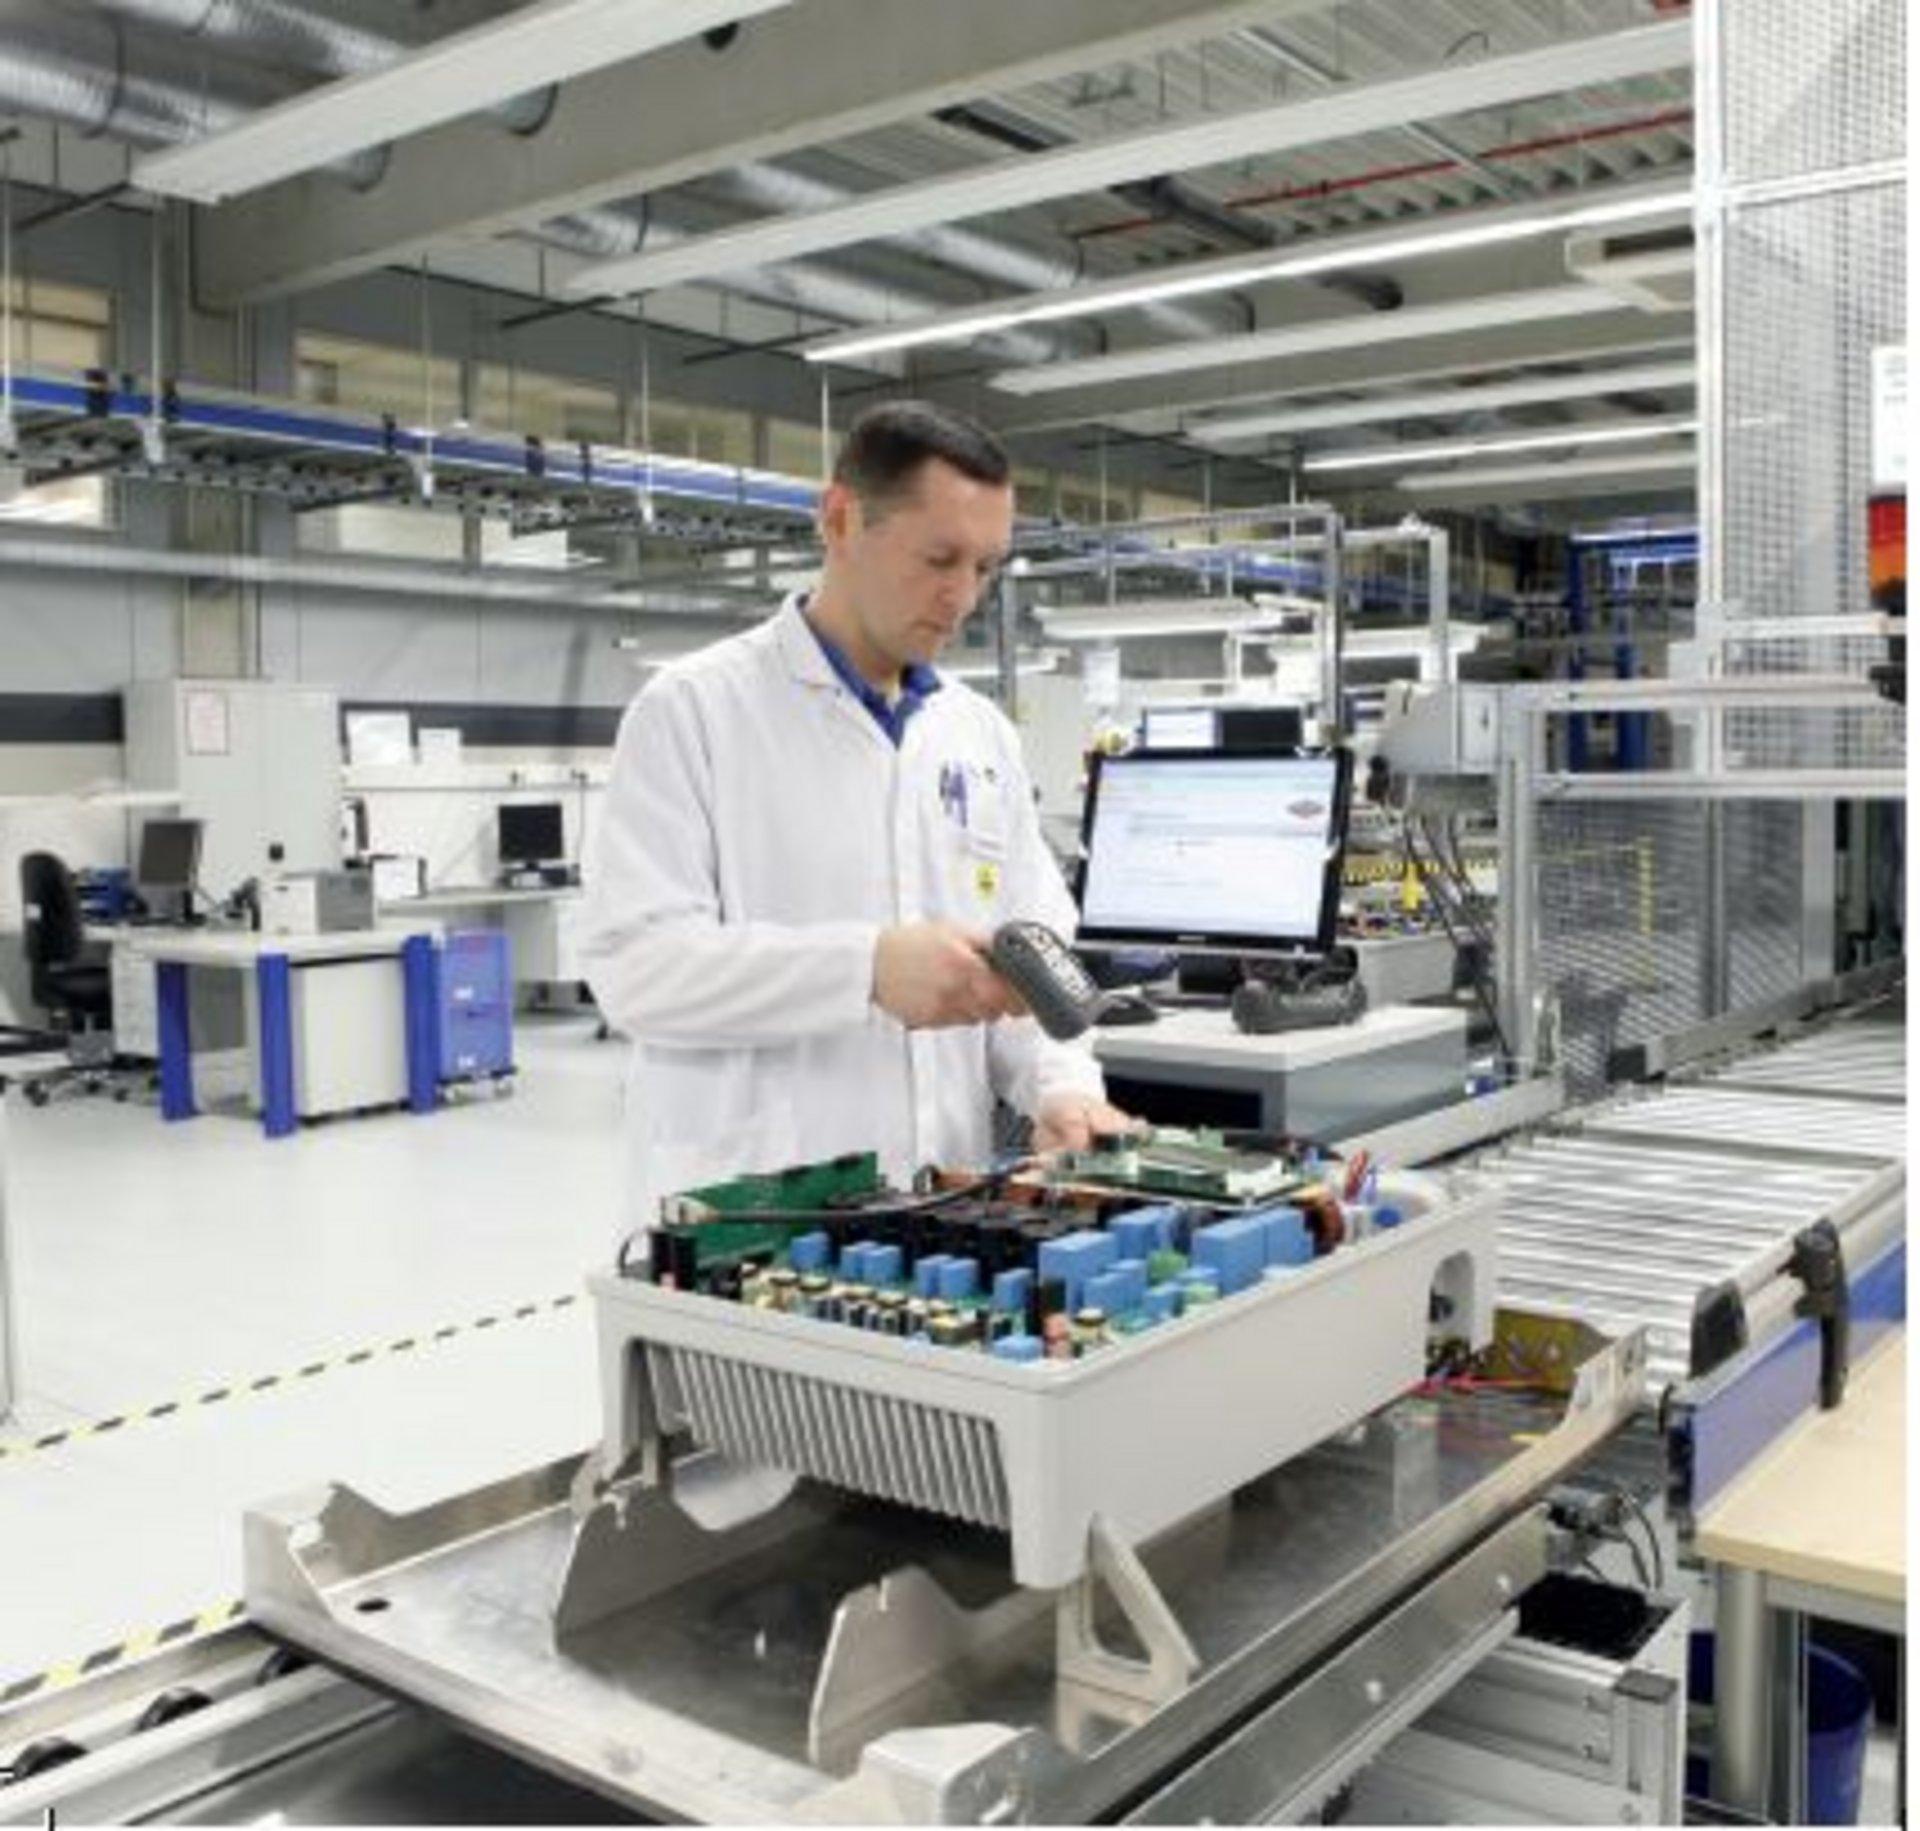 Komponentenhersteller KACO new energy GmbH